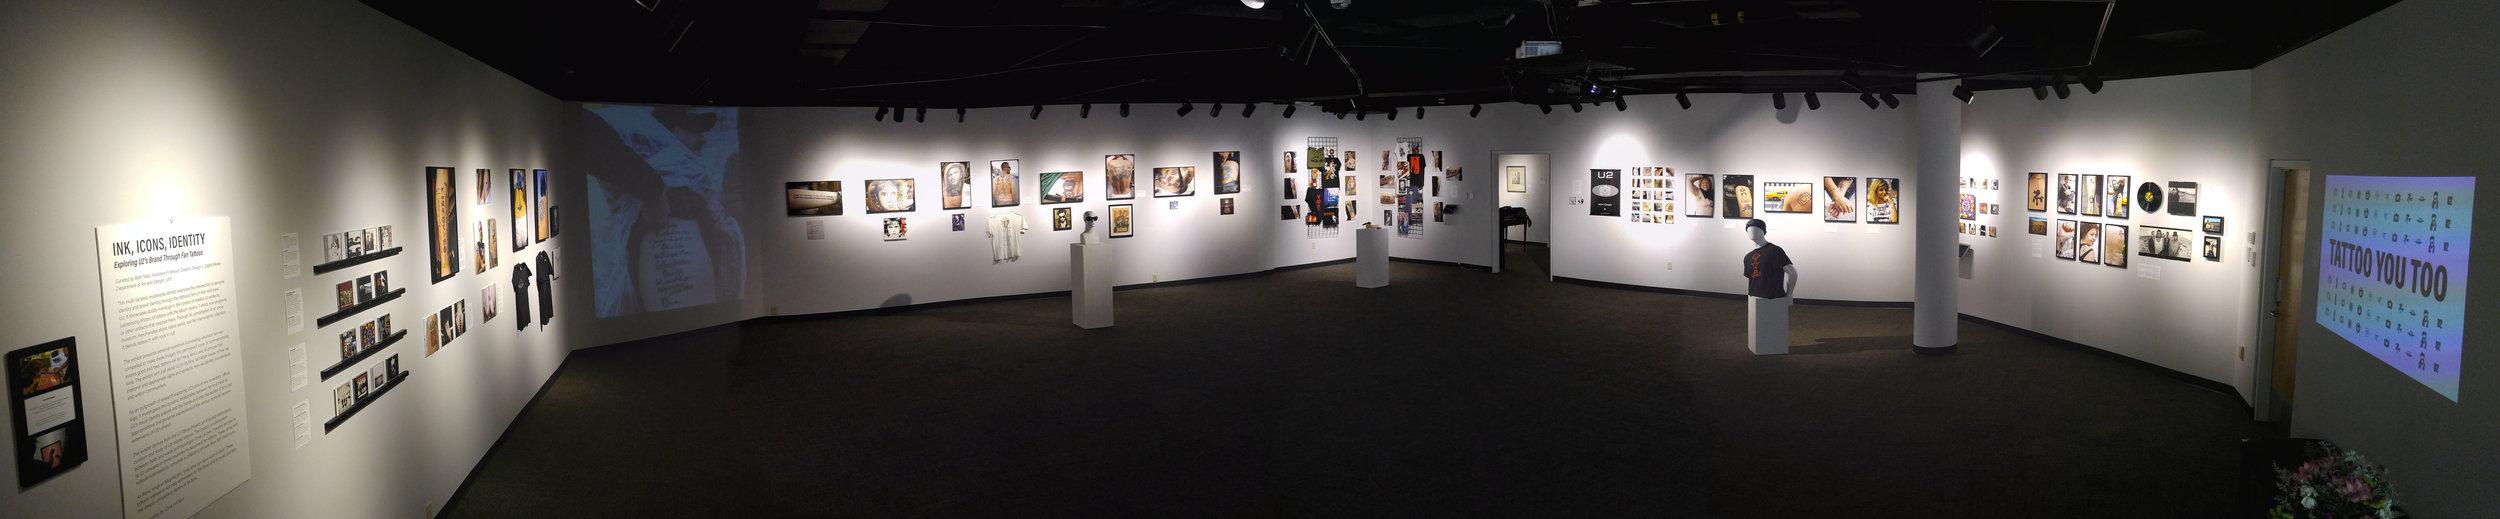 University of North Florida Gallery of Art